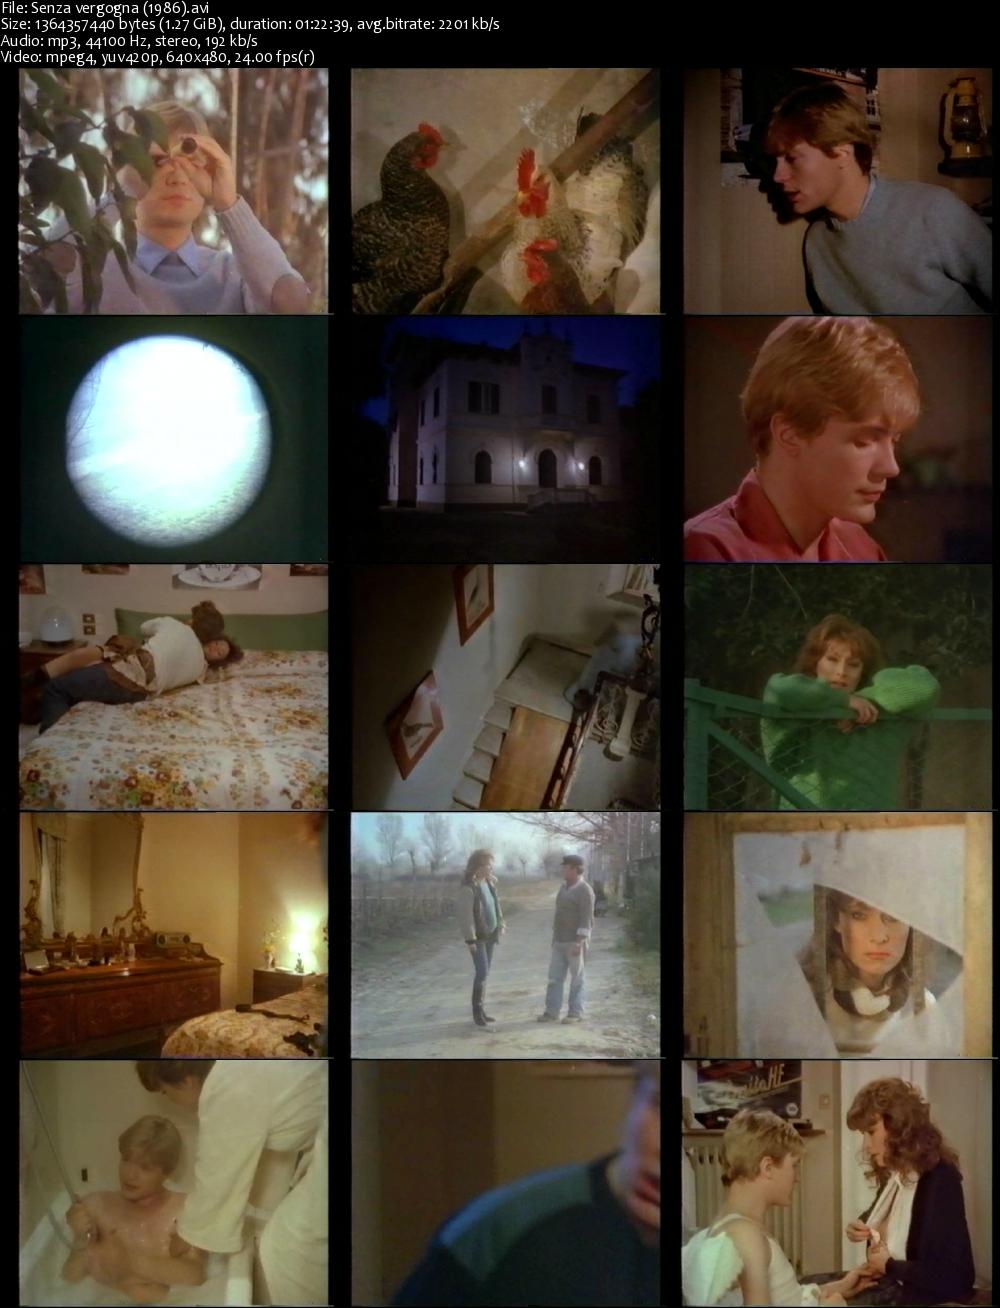 Senza vergogna (1986) Screenshot